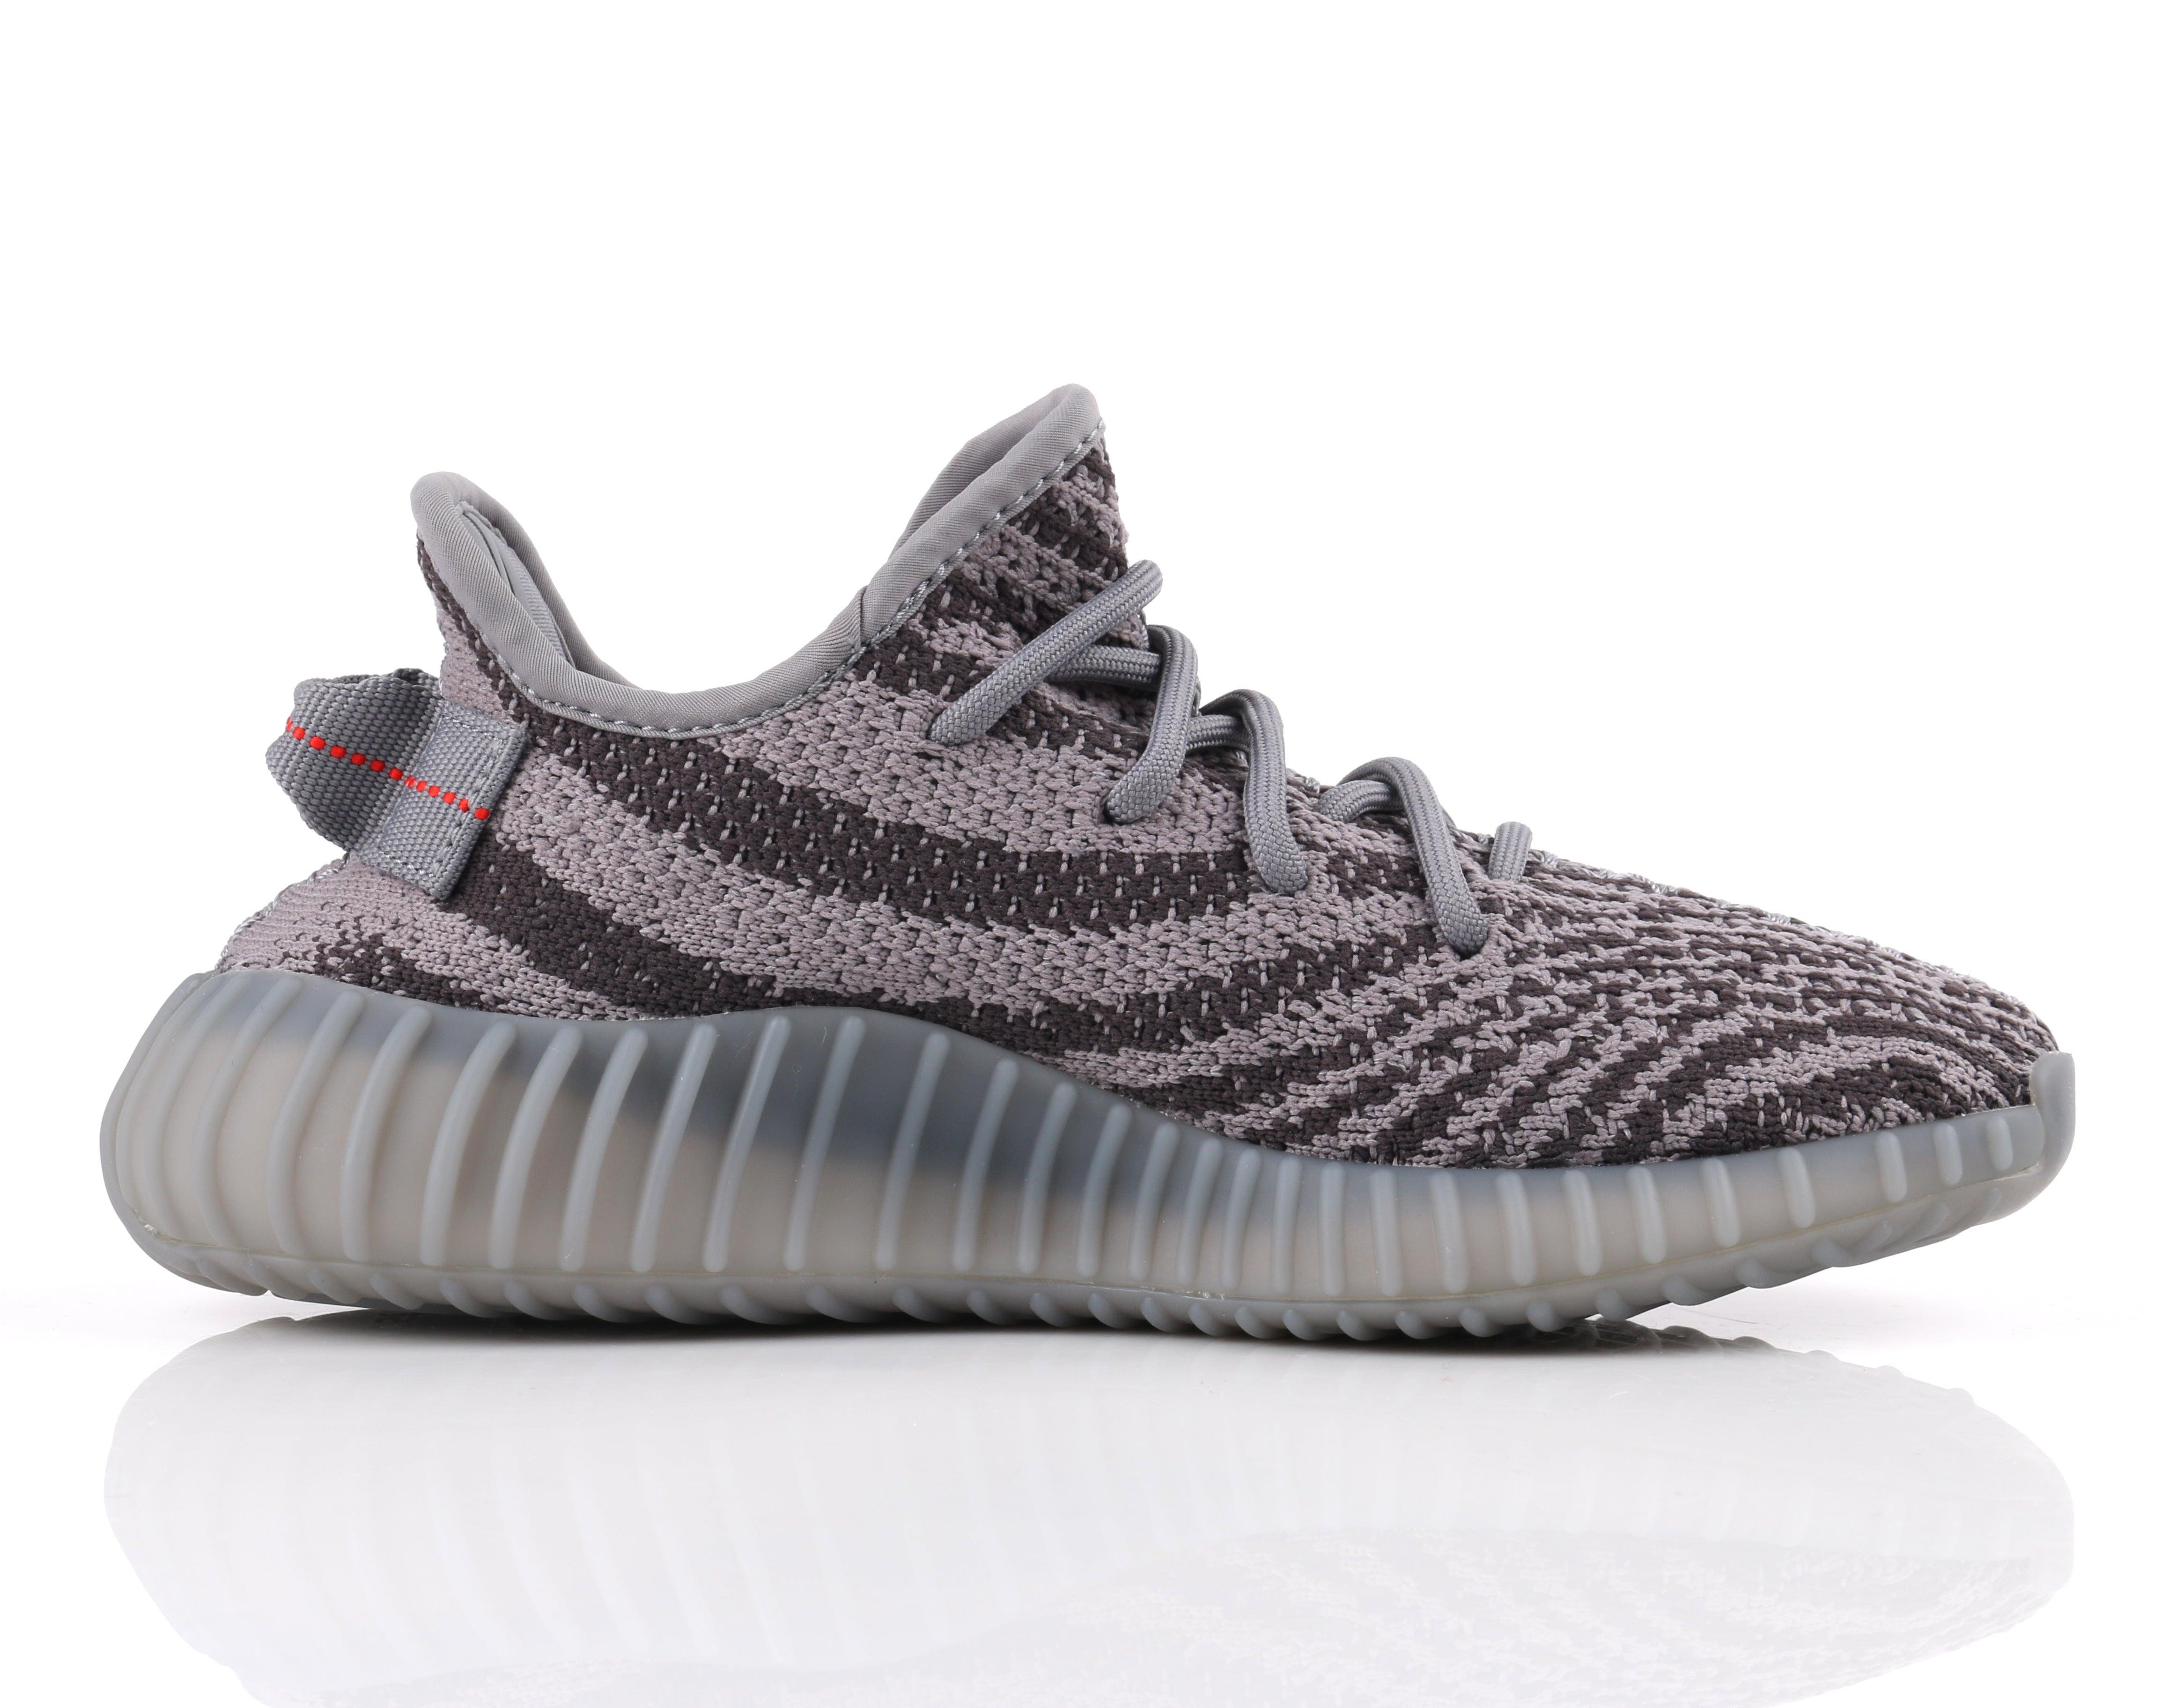 V2 350 Kanye C West 2017 Knit Yeezy Adidas Boost Beluga 2 Gray 0 Ybf76gy